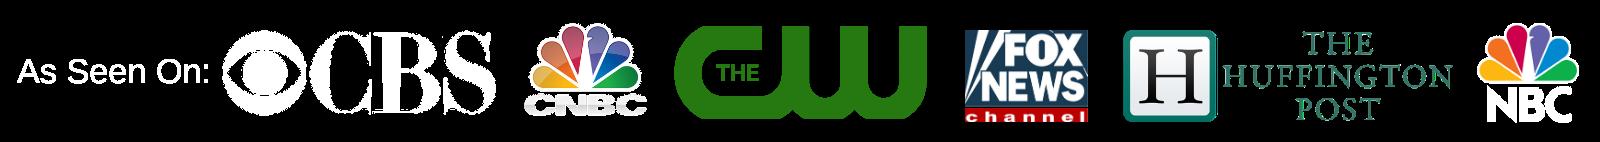 Network Logos Long